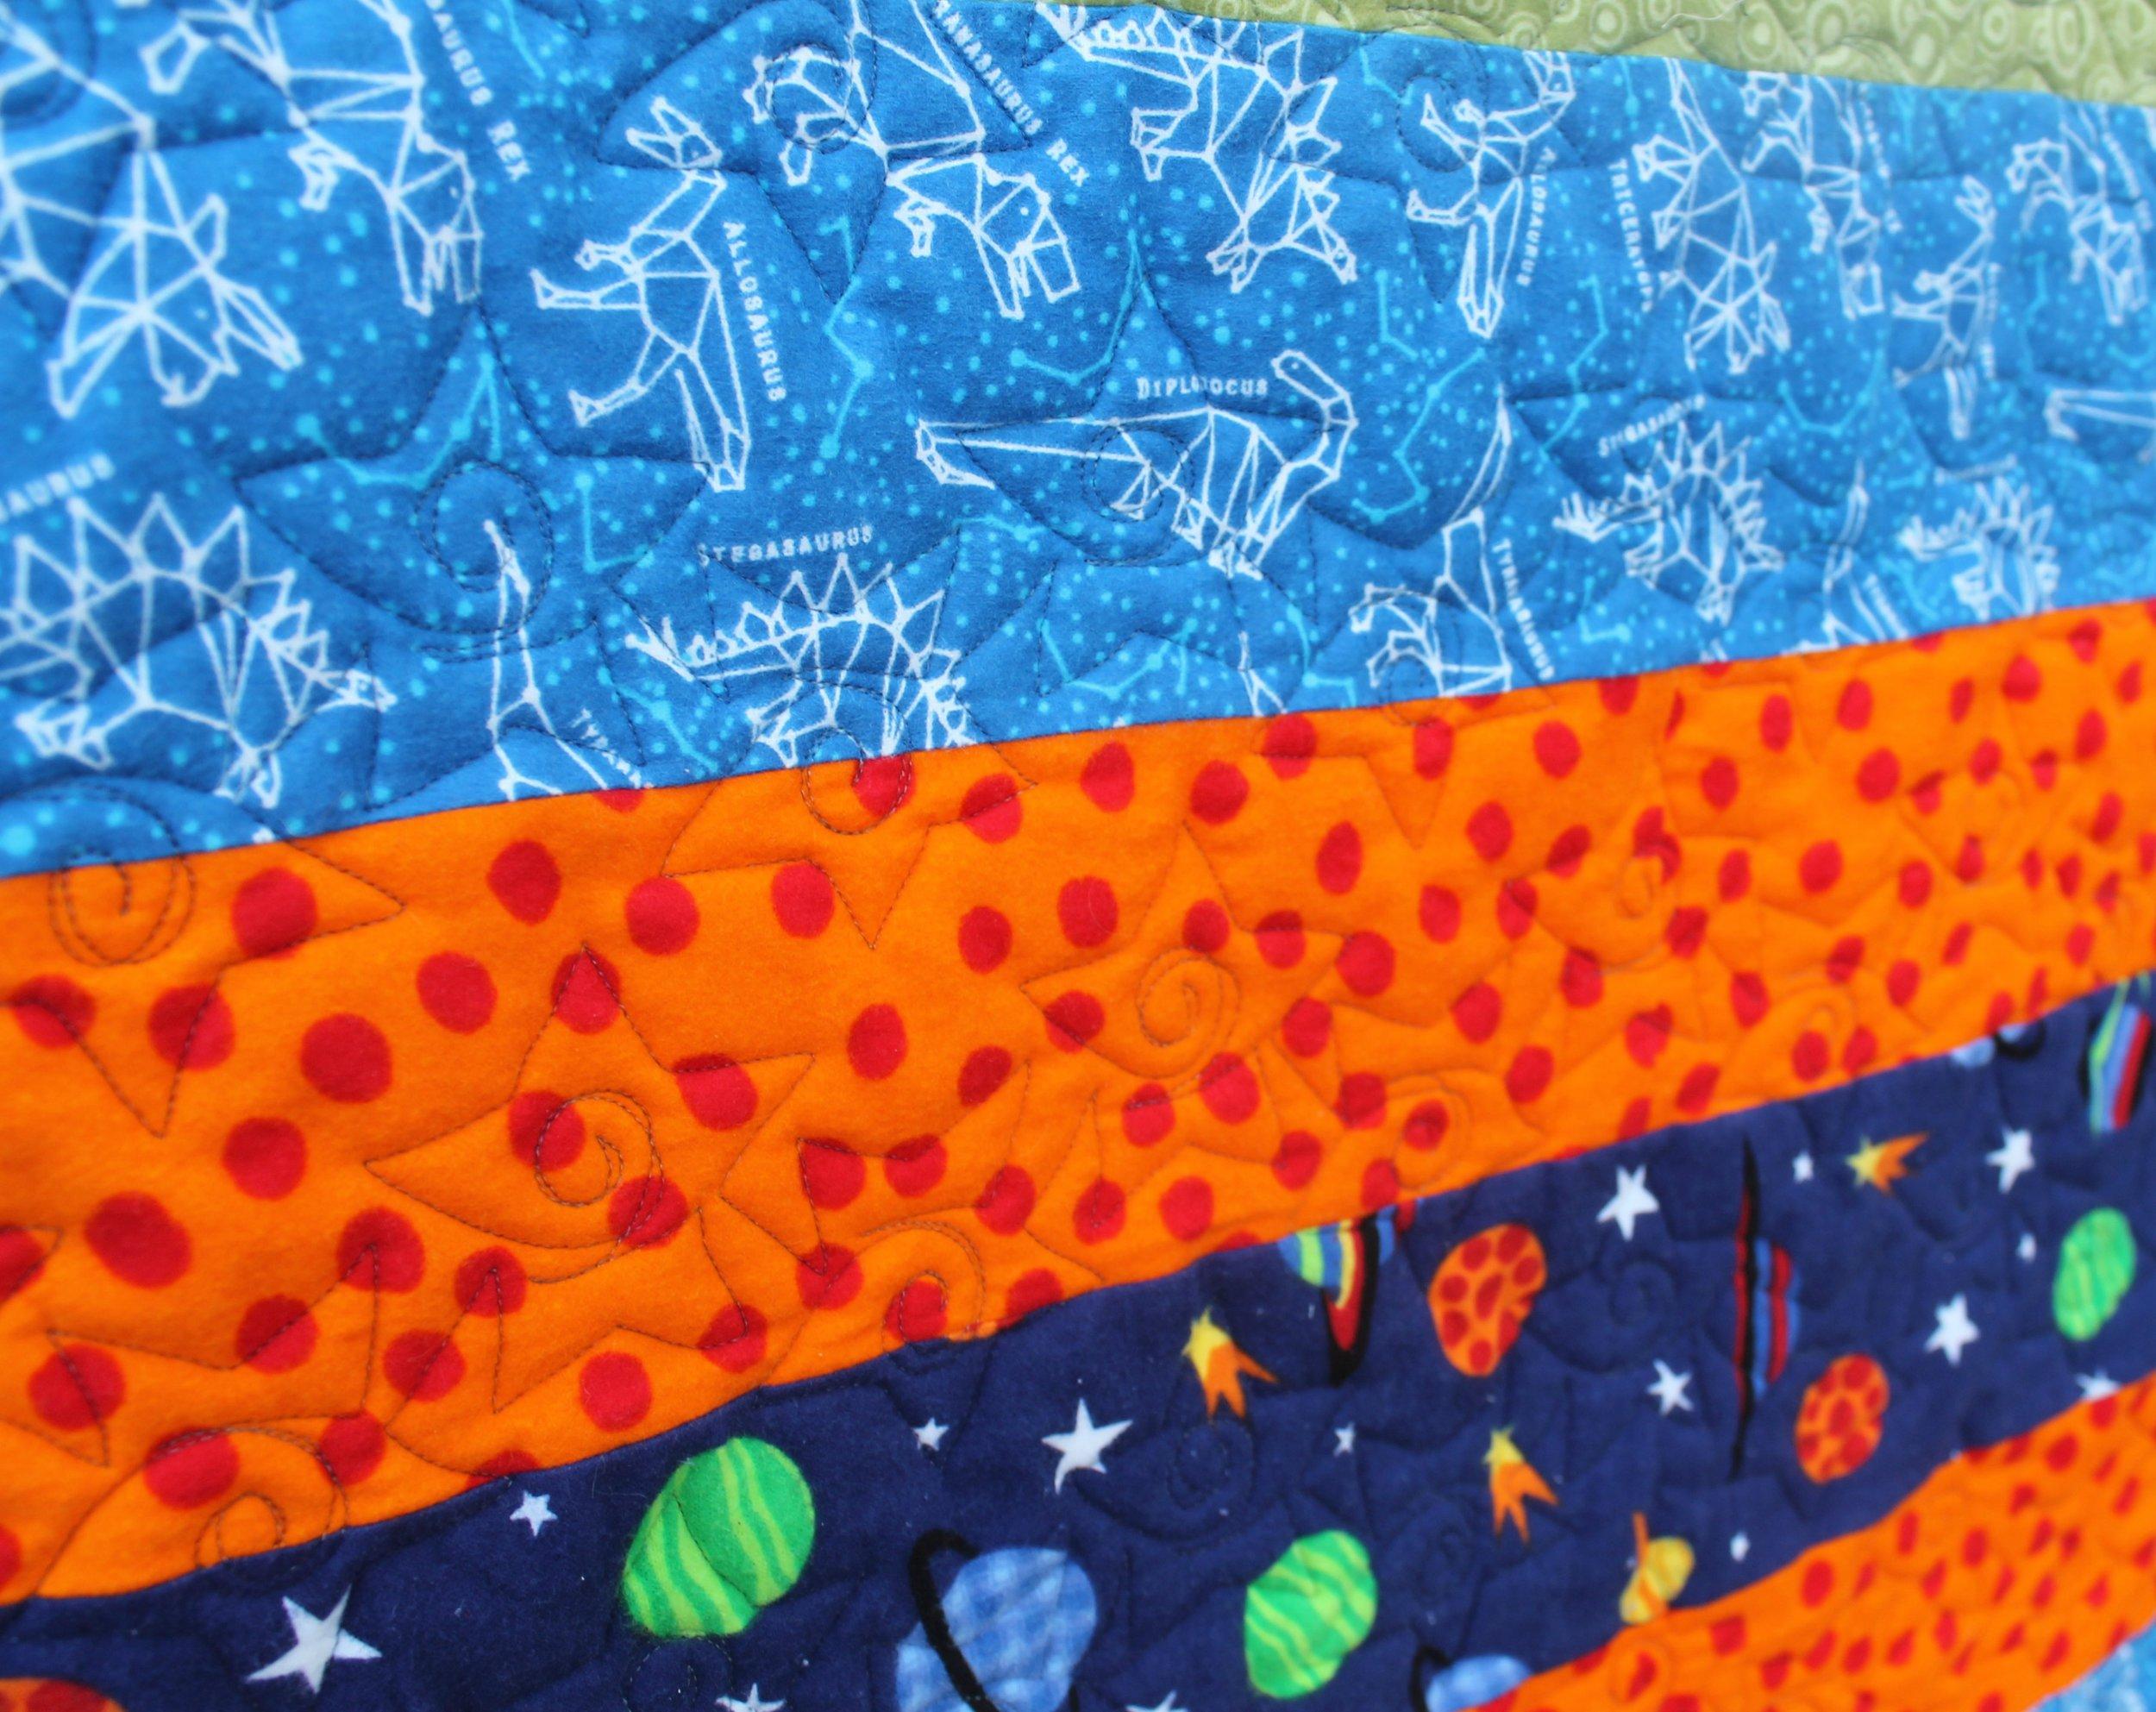 space_flannel_quilt2.jpg